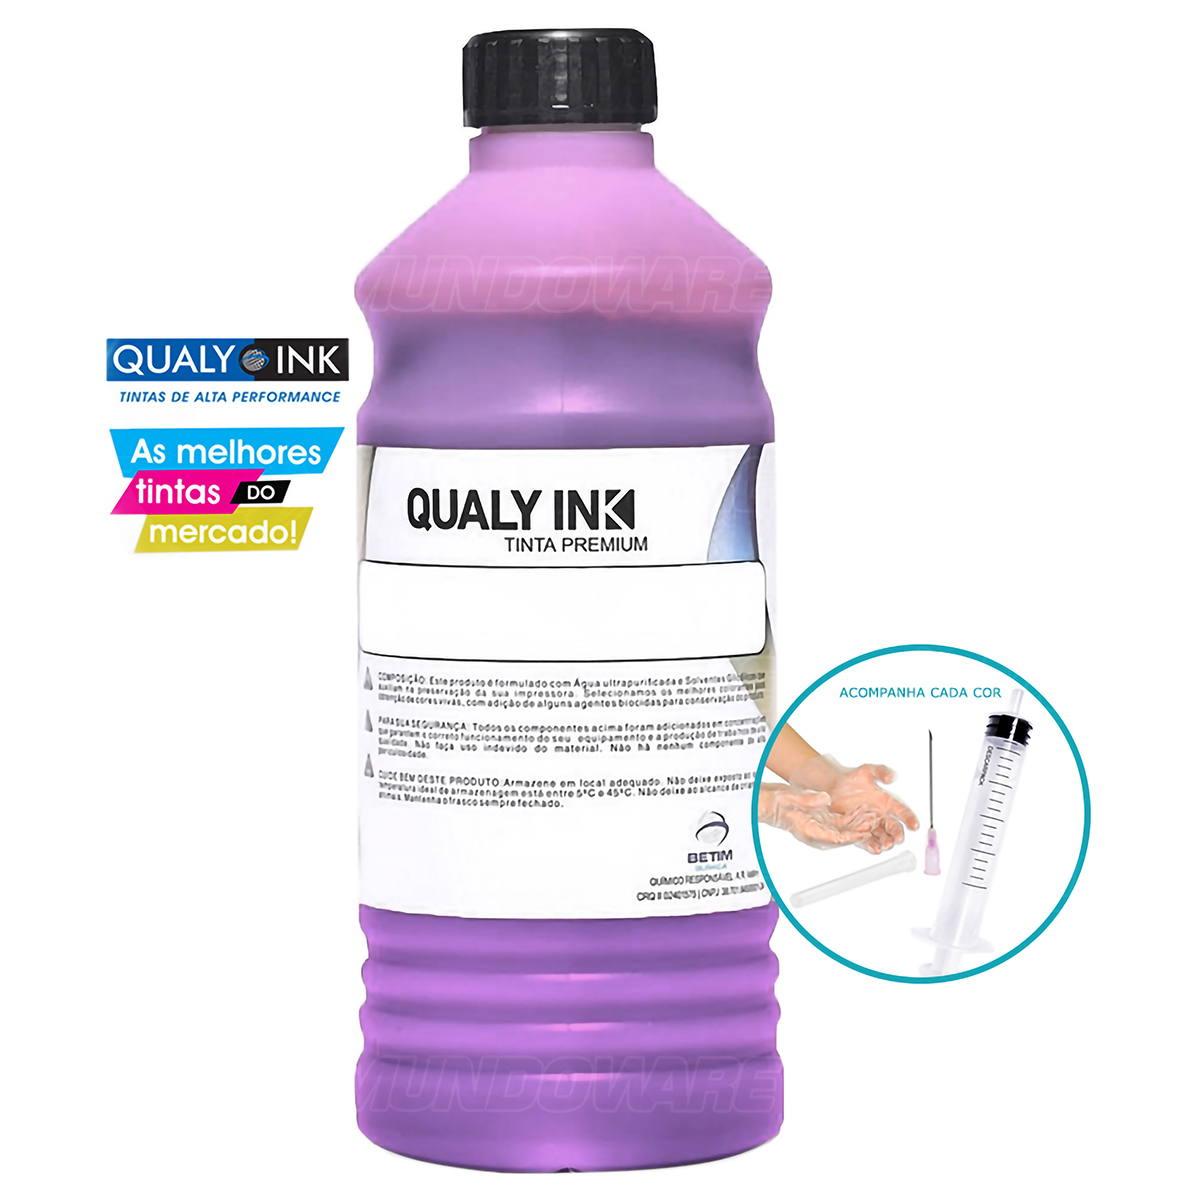 Compatível: Tinta Corante Qualy-Ink MC3H-1180 para HP Pro 251dw 276dw 6830 8625 8500 8600 8600 Magenta Refil 1L